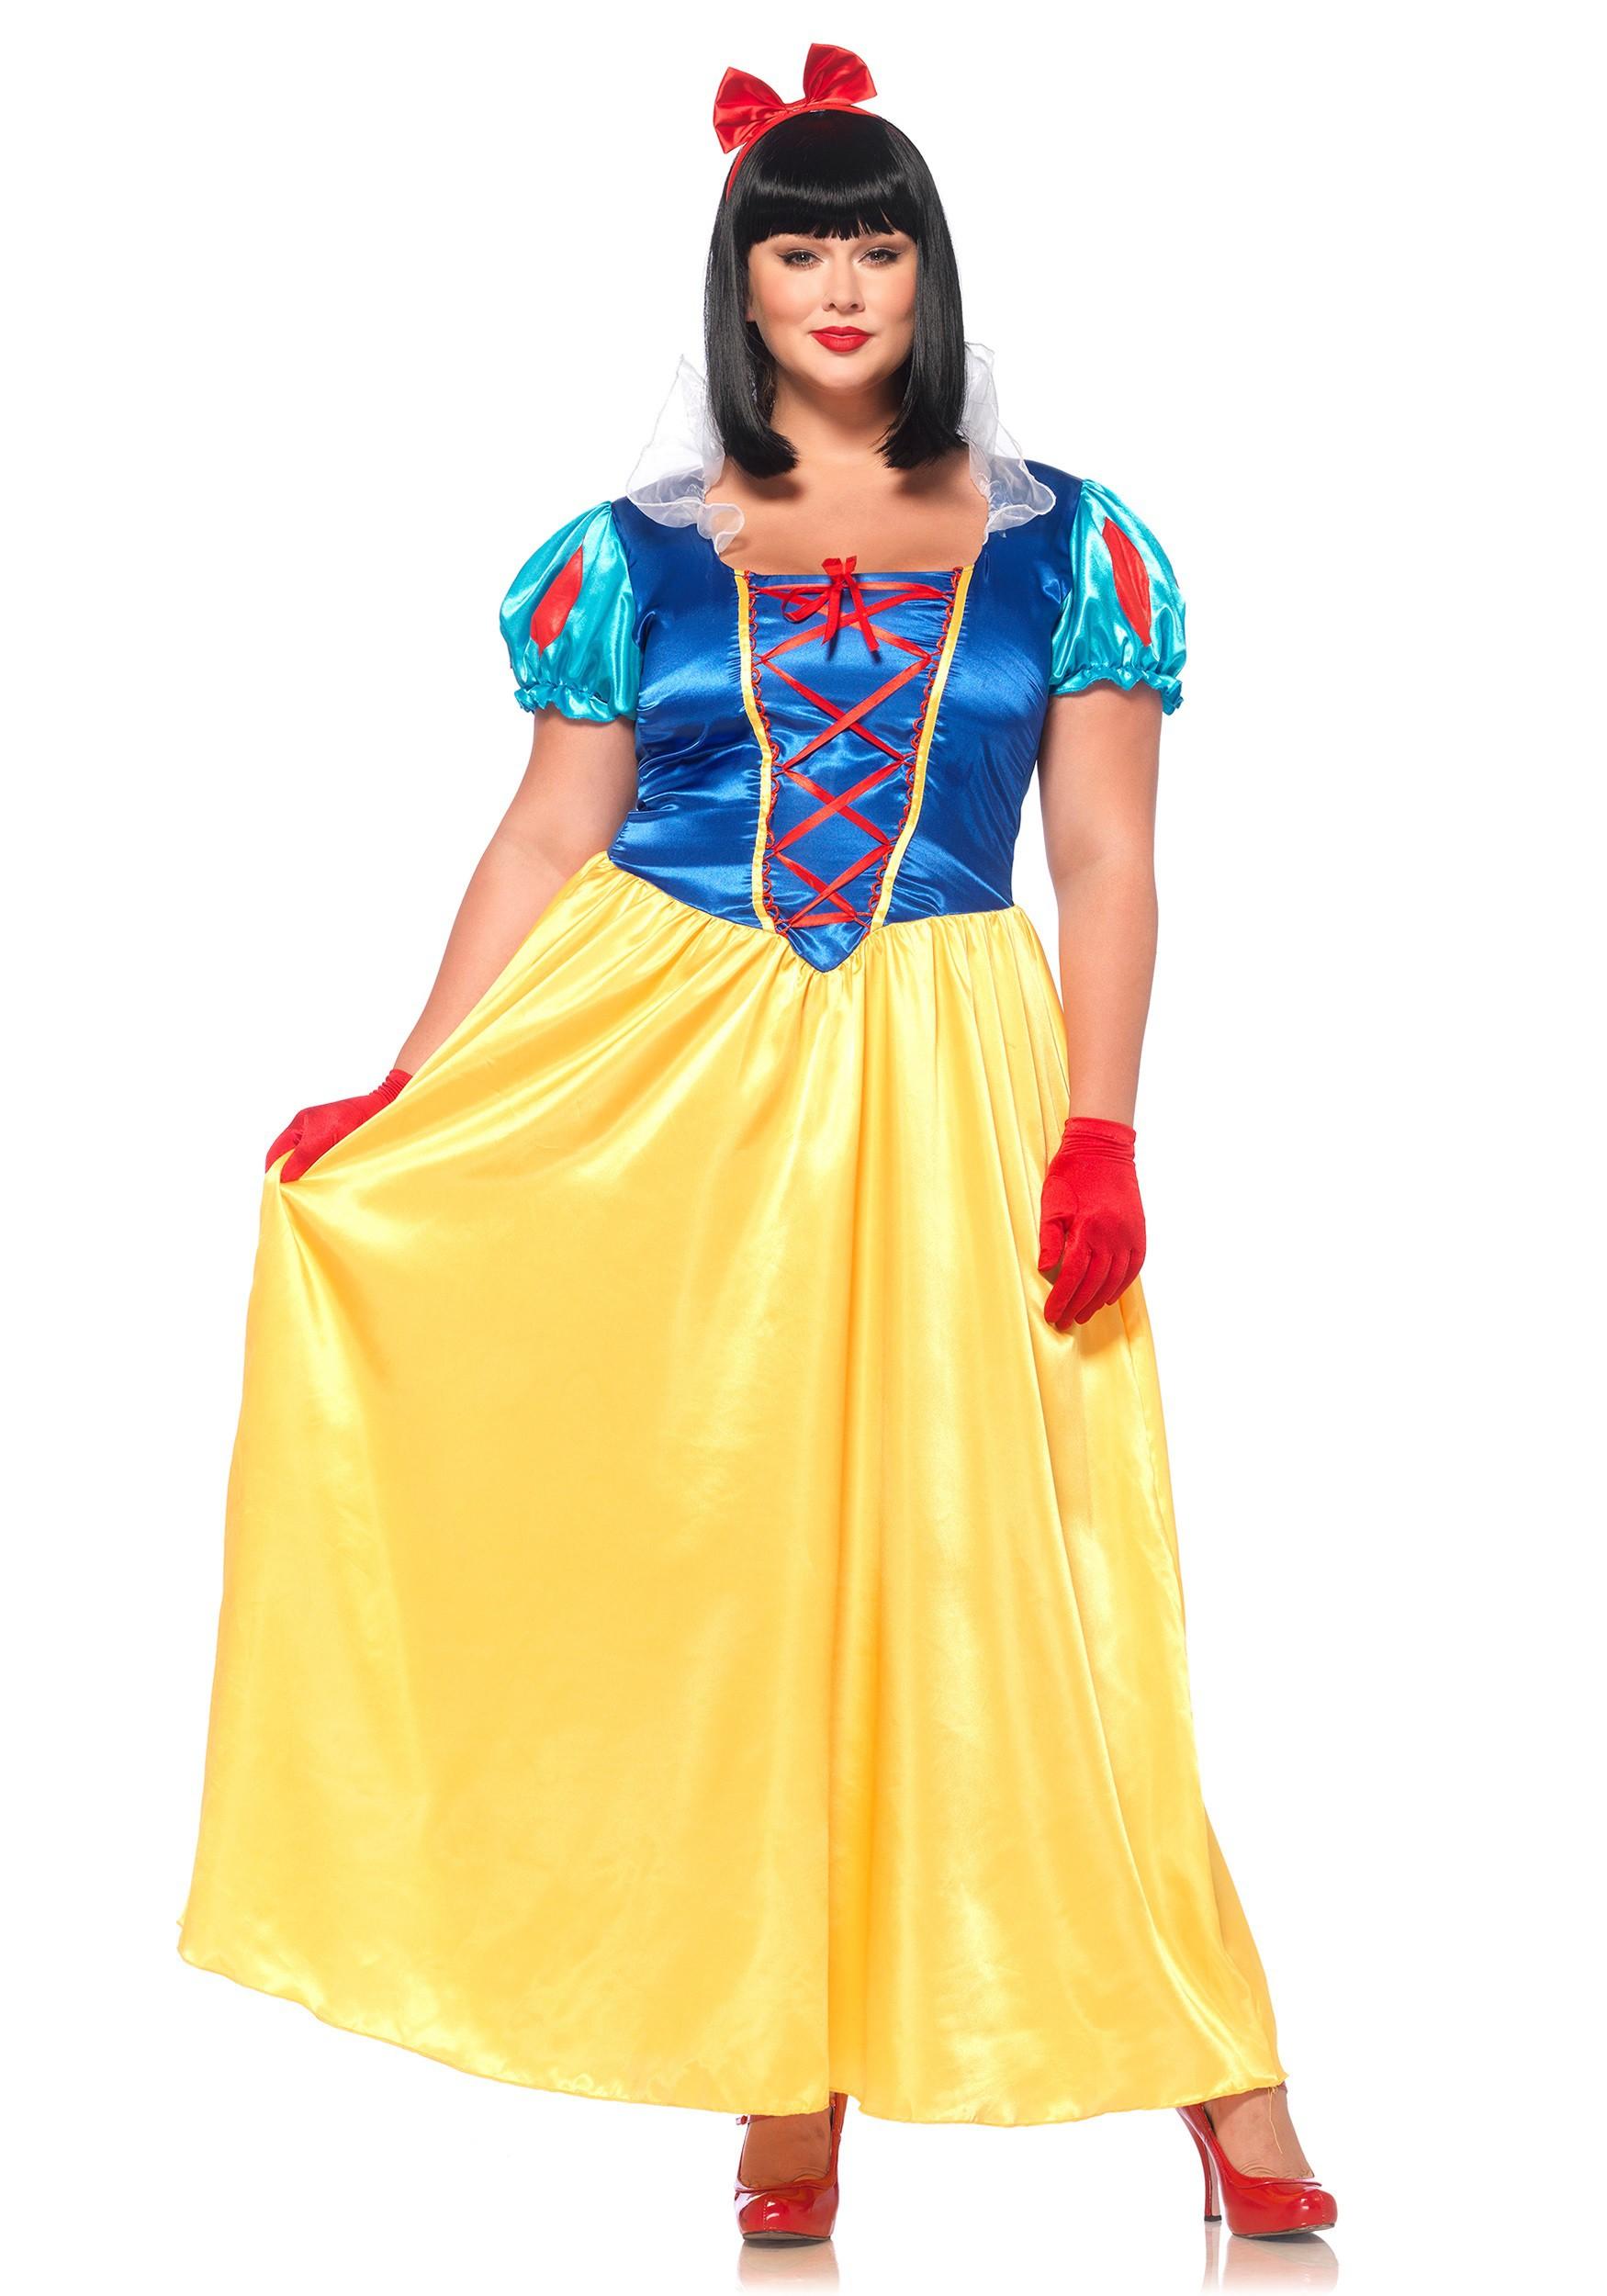 Plus Size Classic Snow White Costume | Exclusive